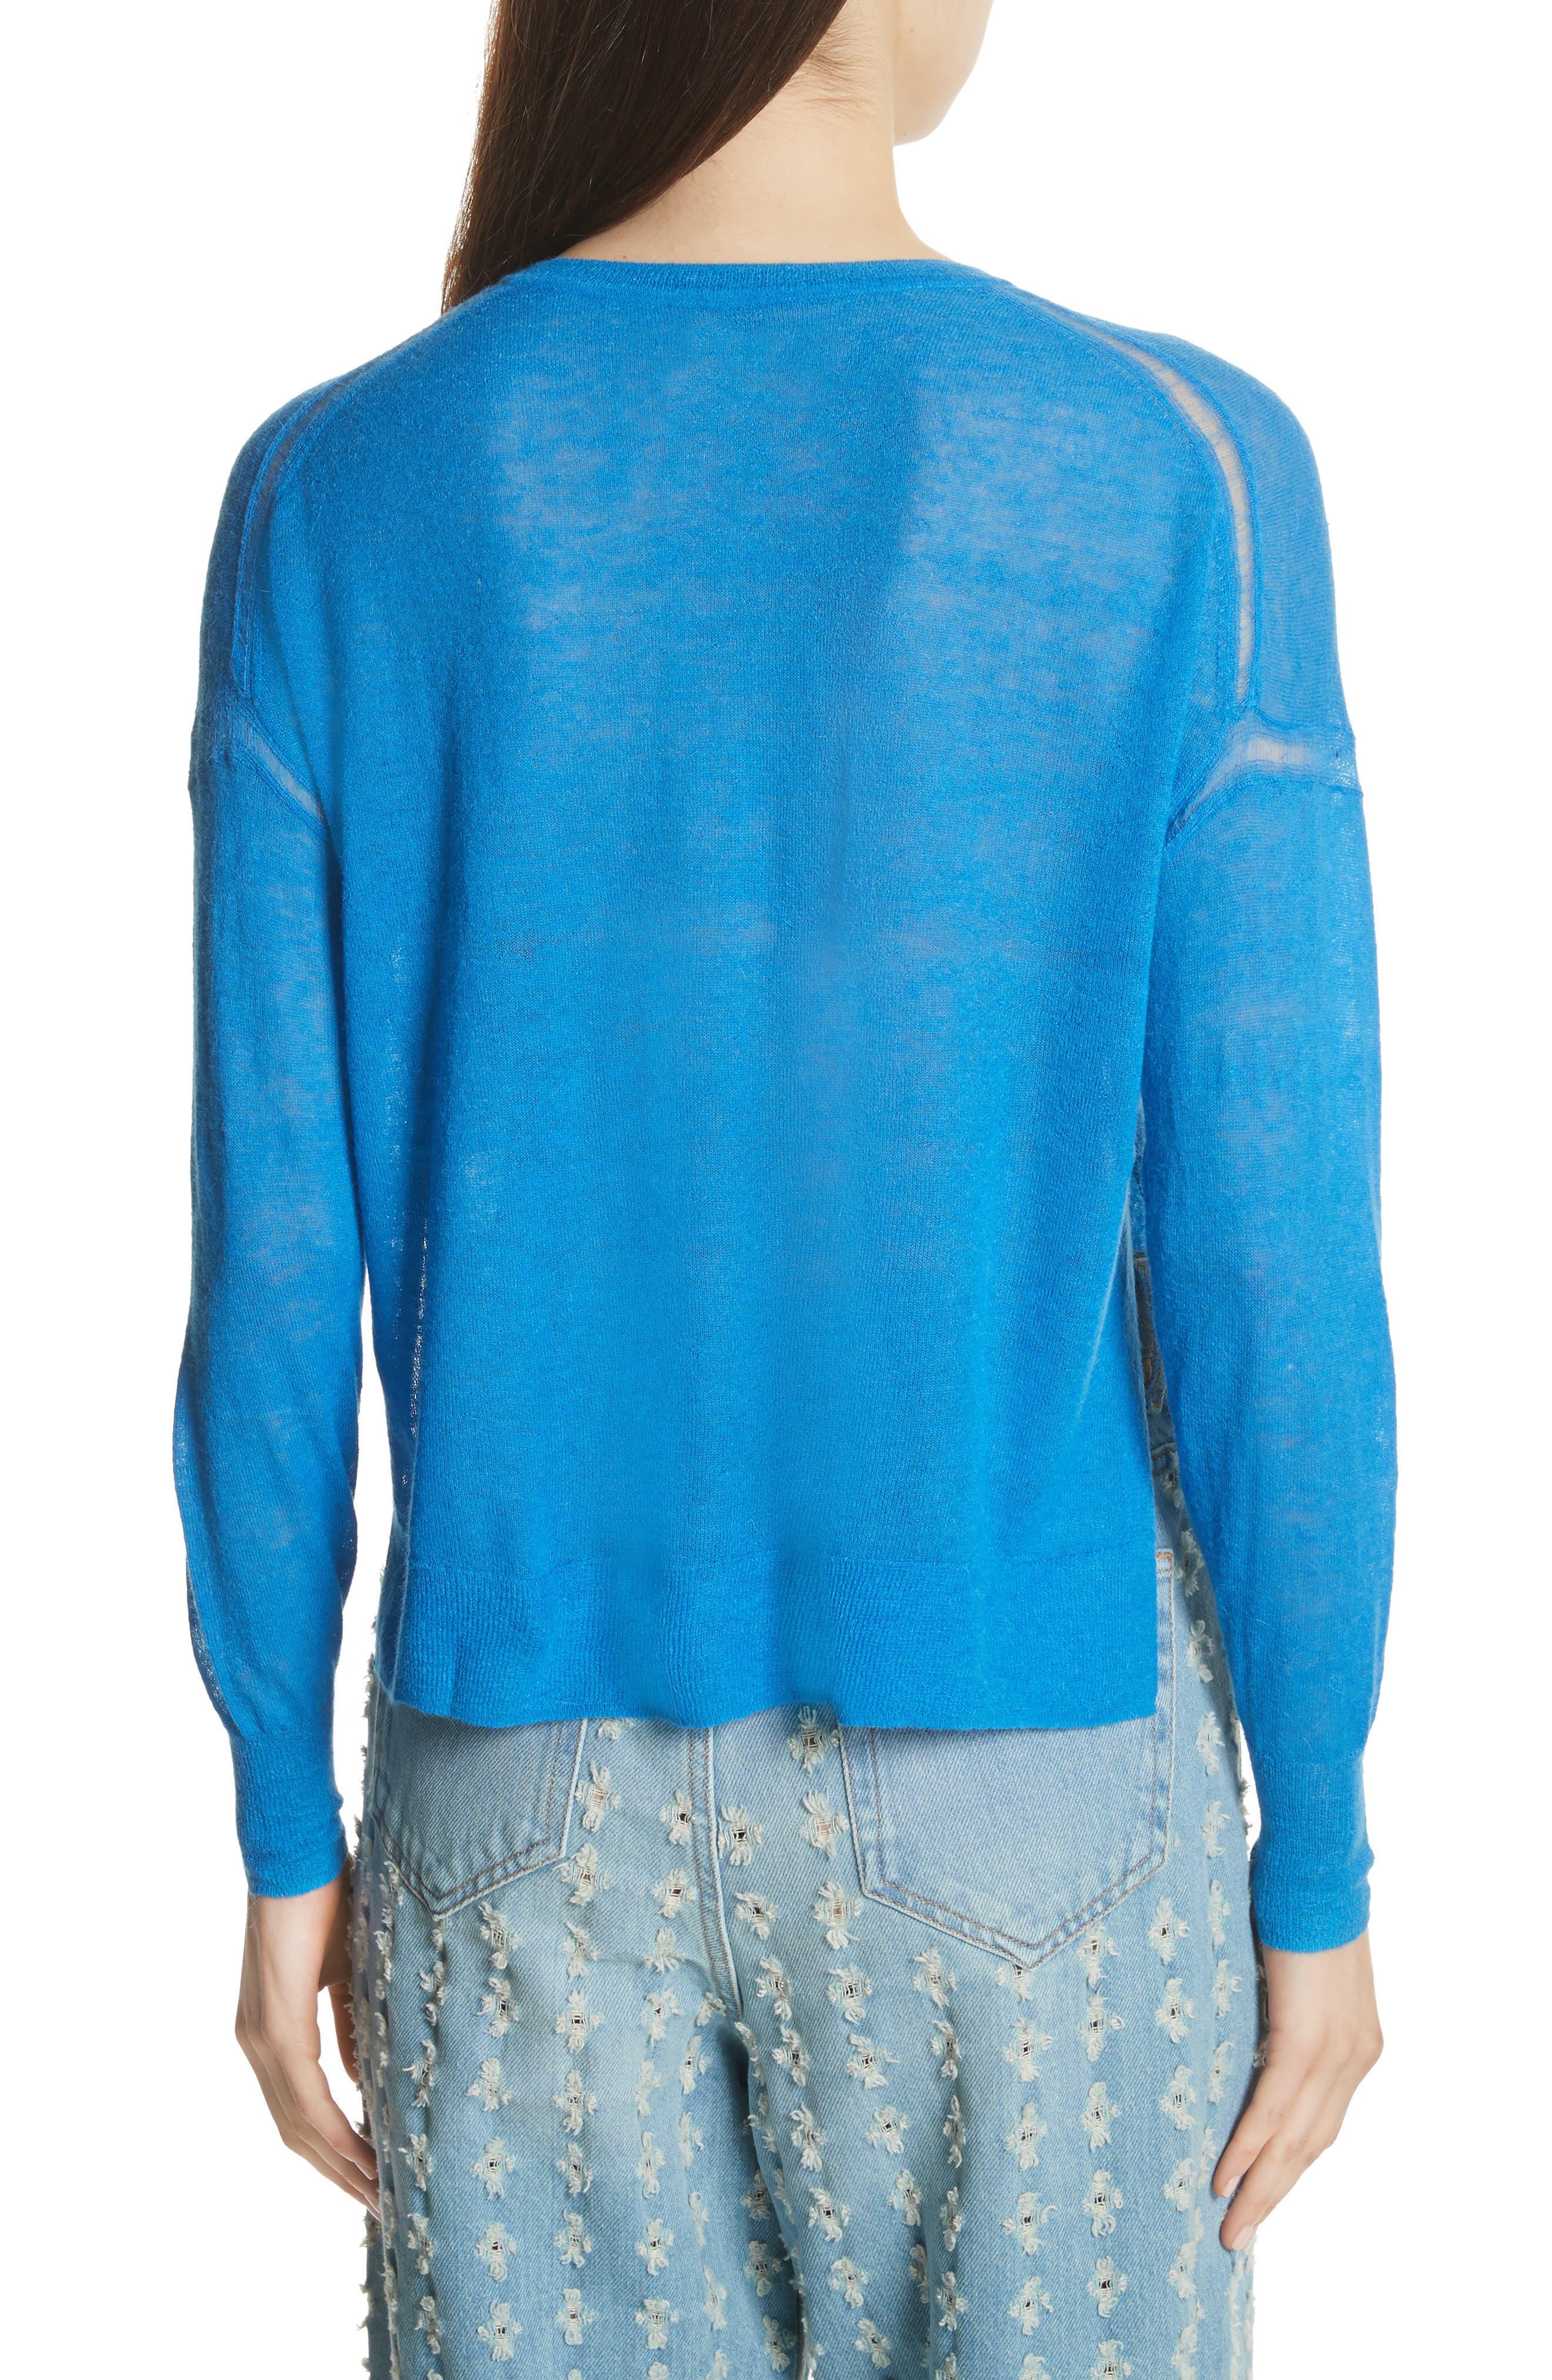 Isabel Marant Étoile Wool & Alpaca Blend Sweater,                             Alternate thumbnail 2, color,